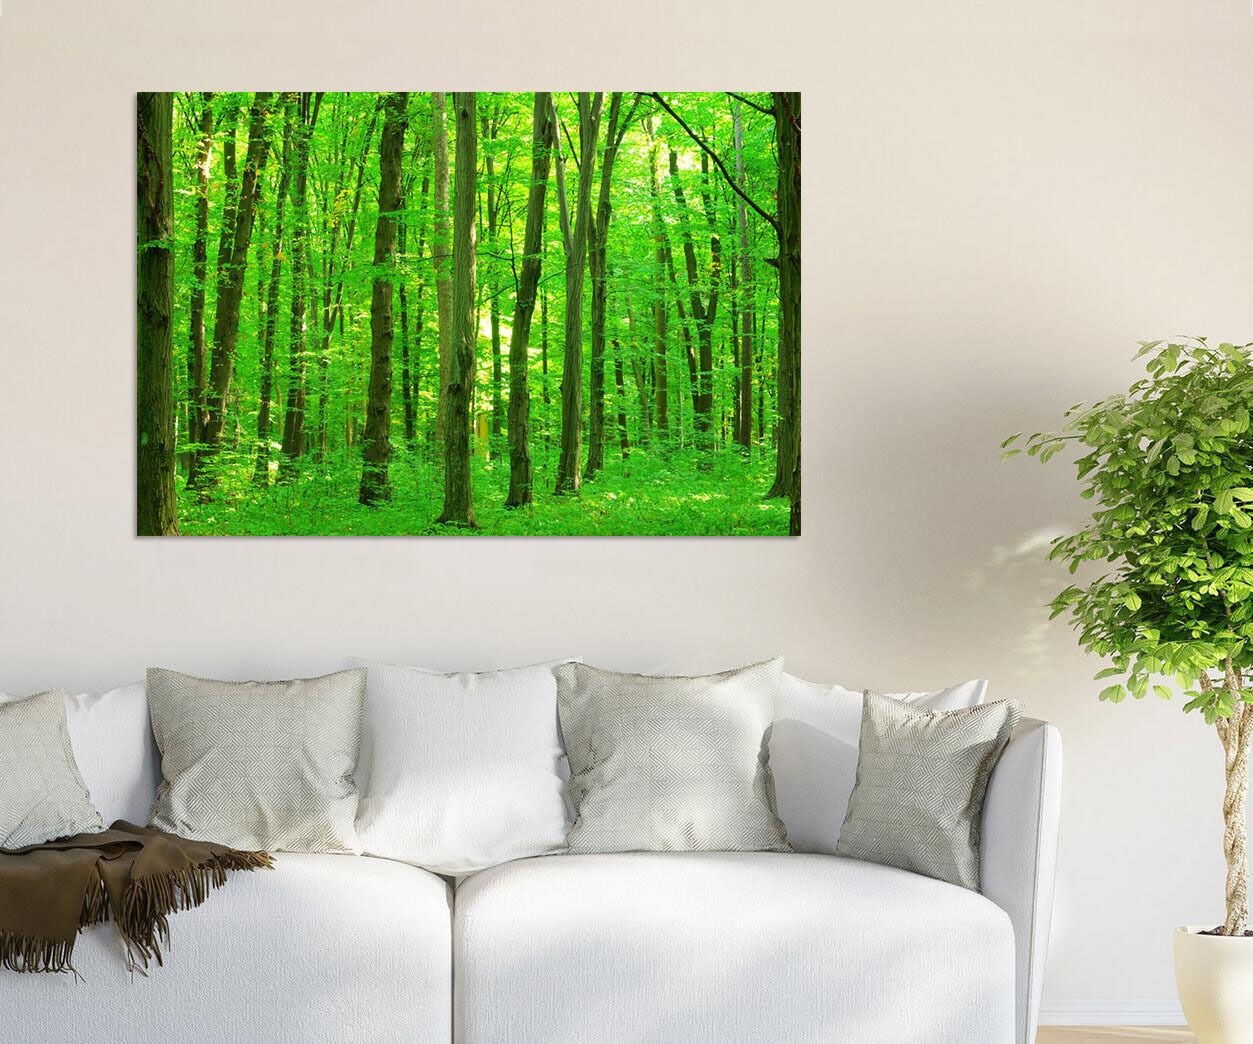 3D Natur Üppige greene Haine 764 Fototapeten Wandbild BildTapete AJSTORE DE Lemon